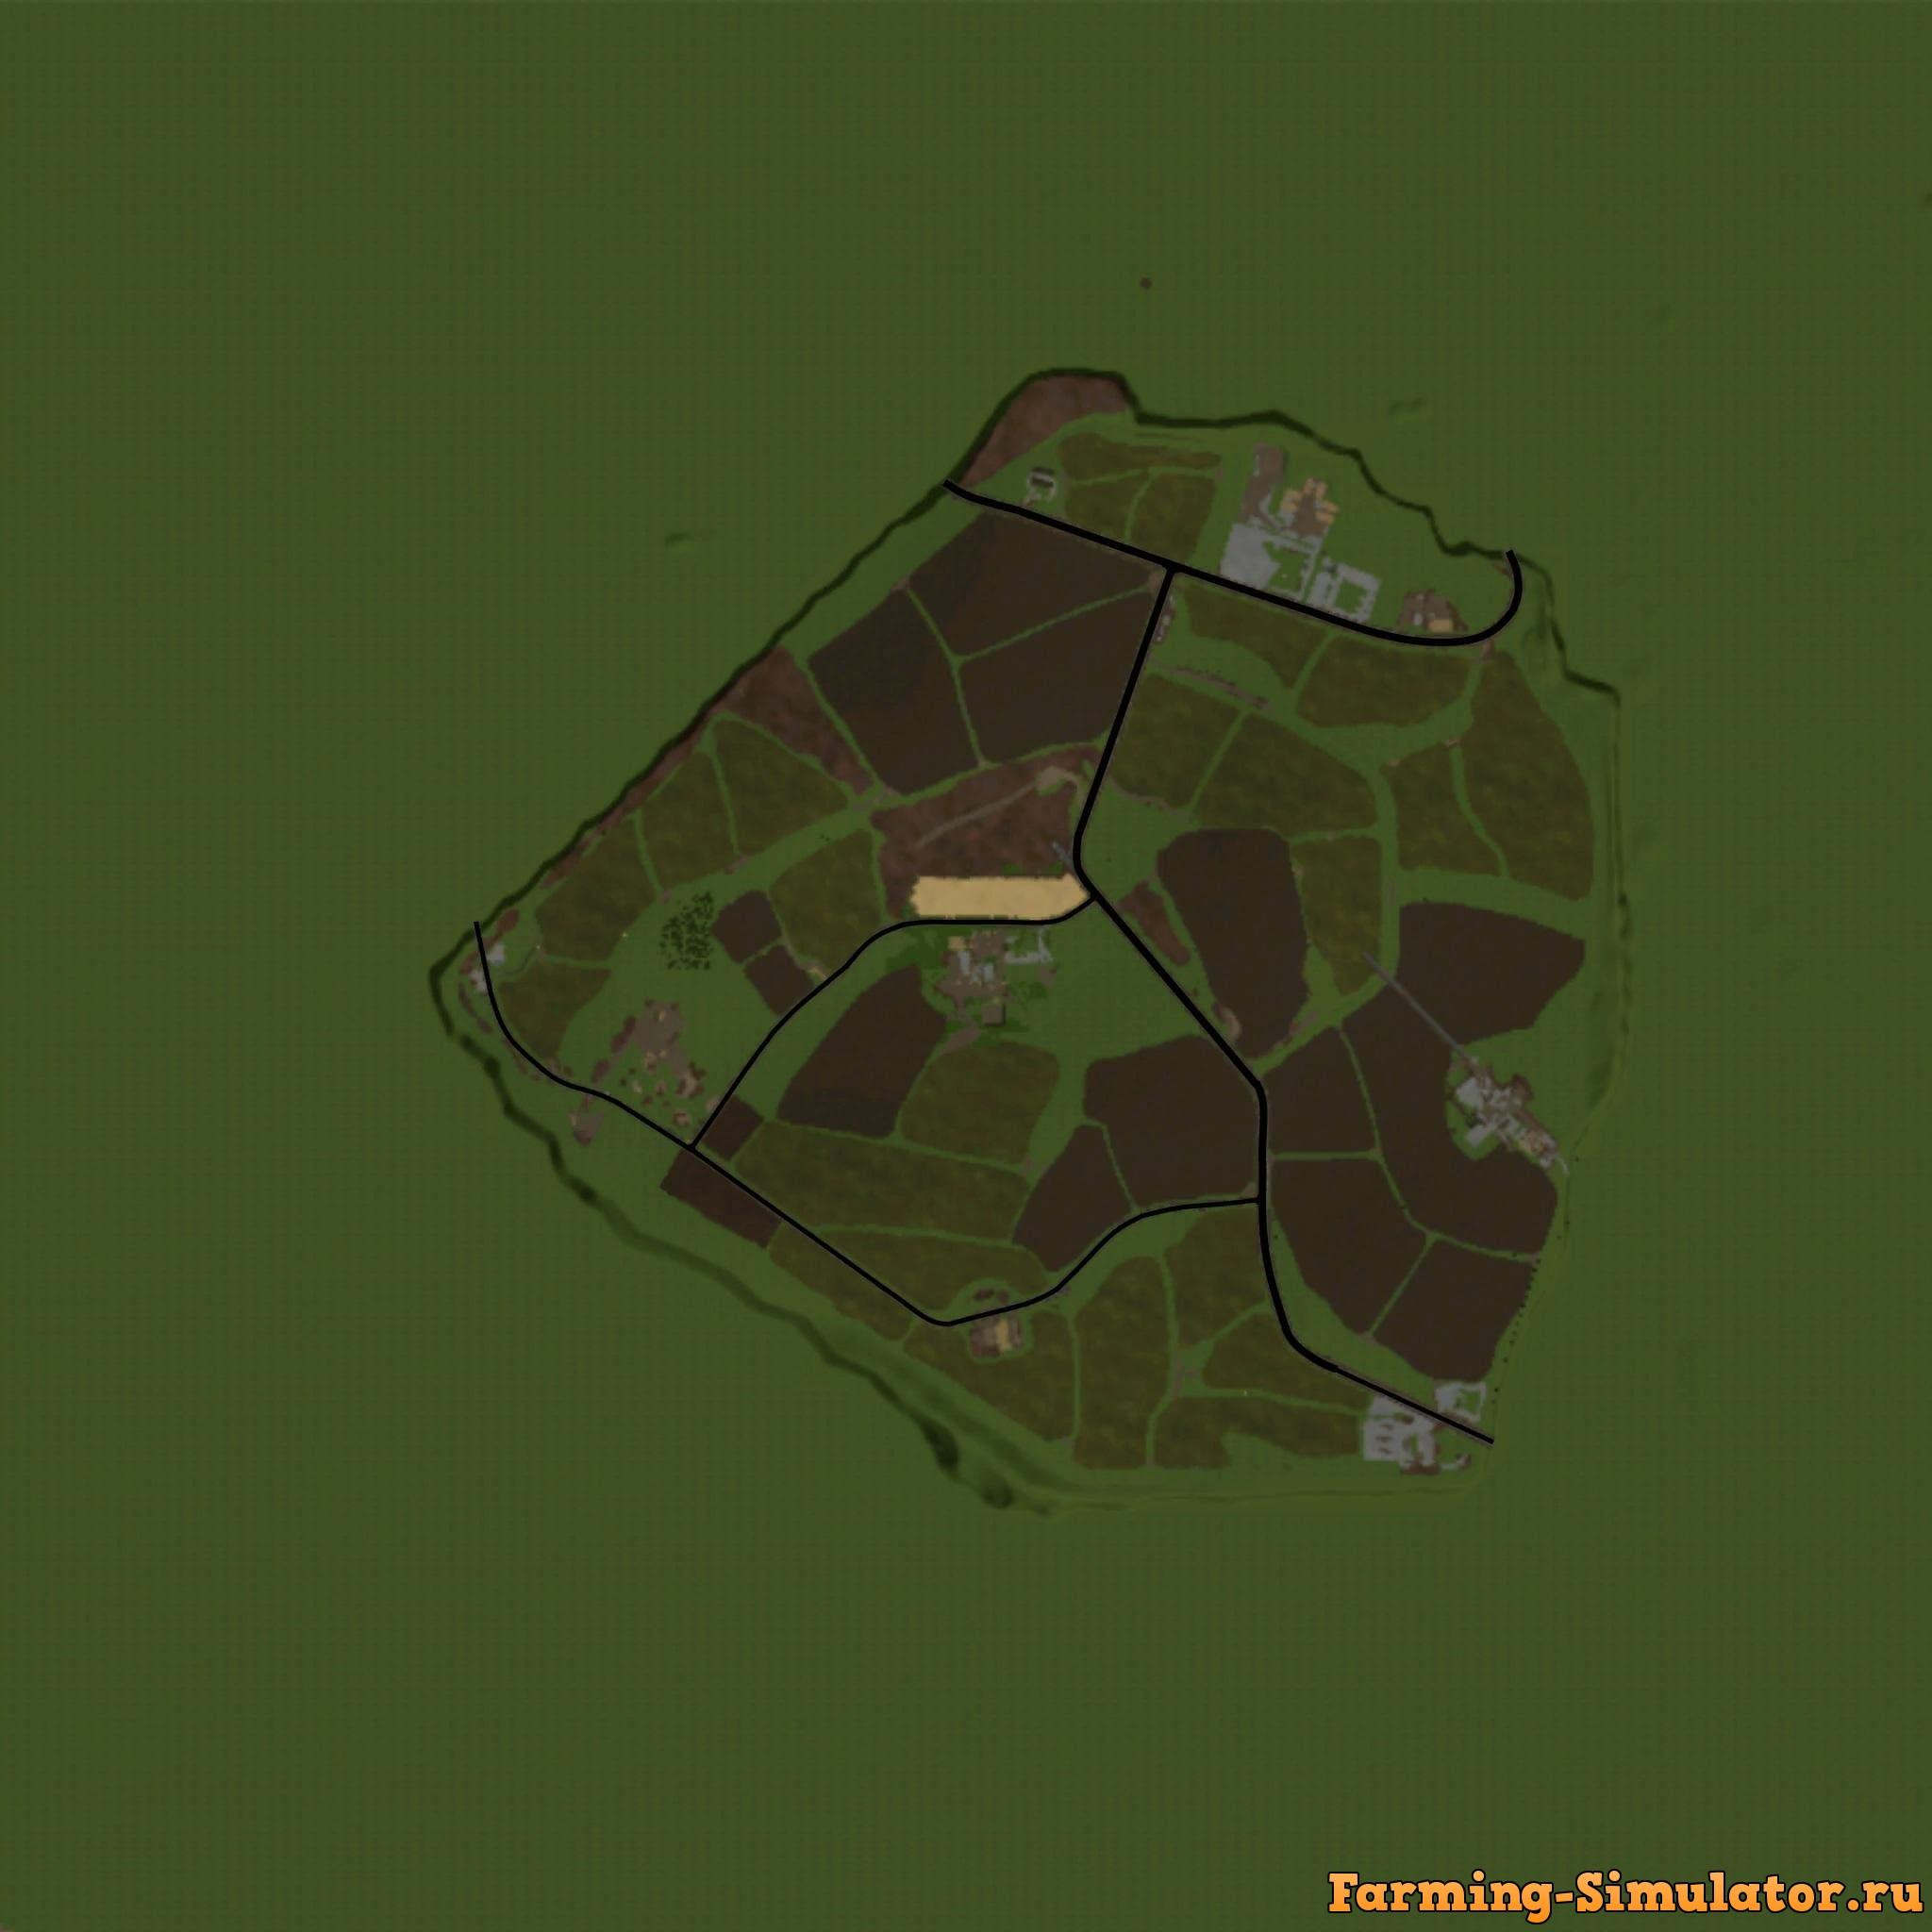 Мод карта NORTH STONE FARM V1.0.0.0 Farming Simulator 17